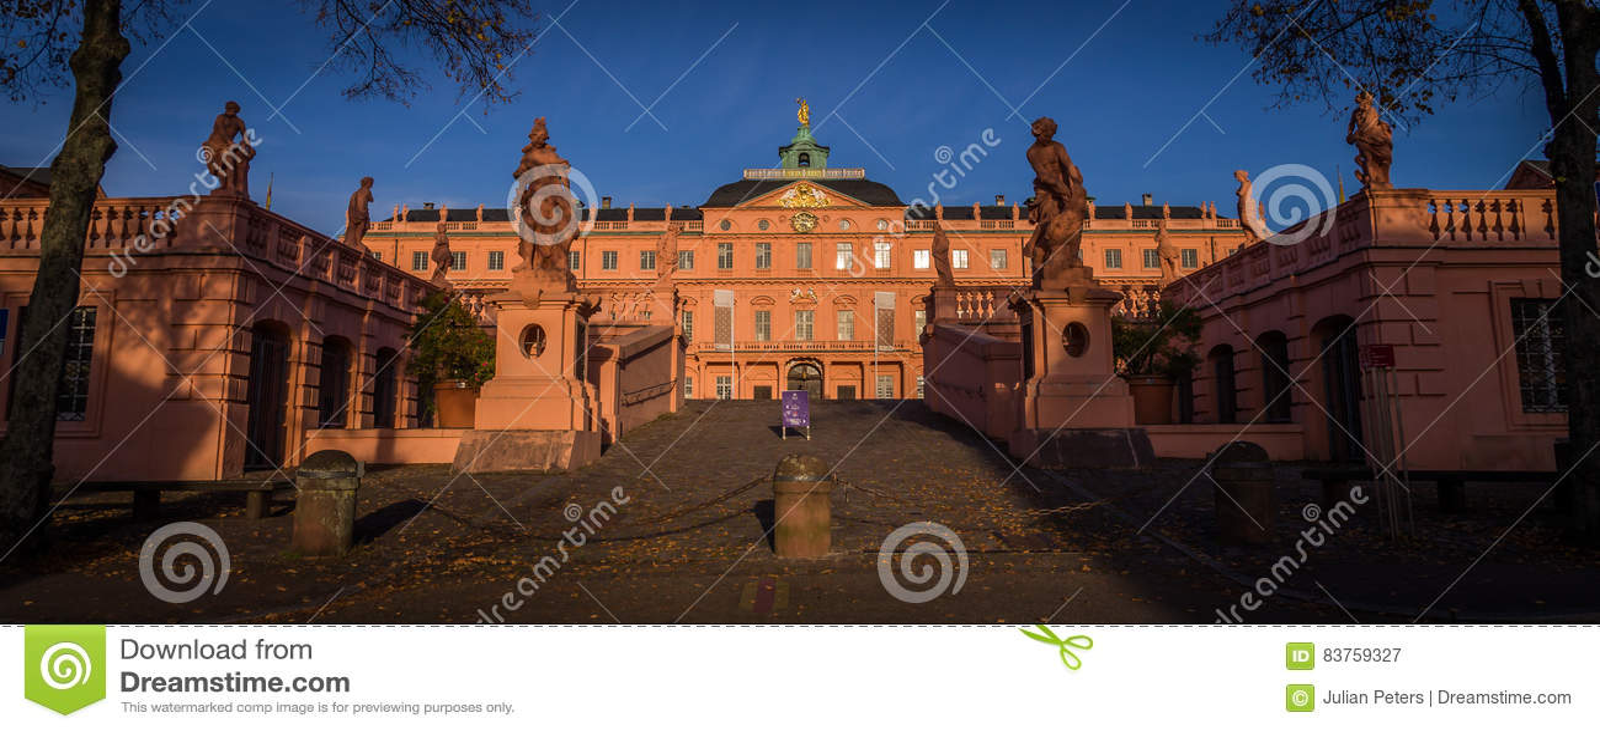 Rastatt Schloss, Baden, Duitsland